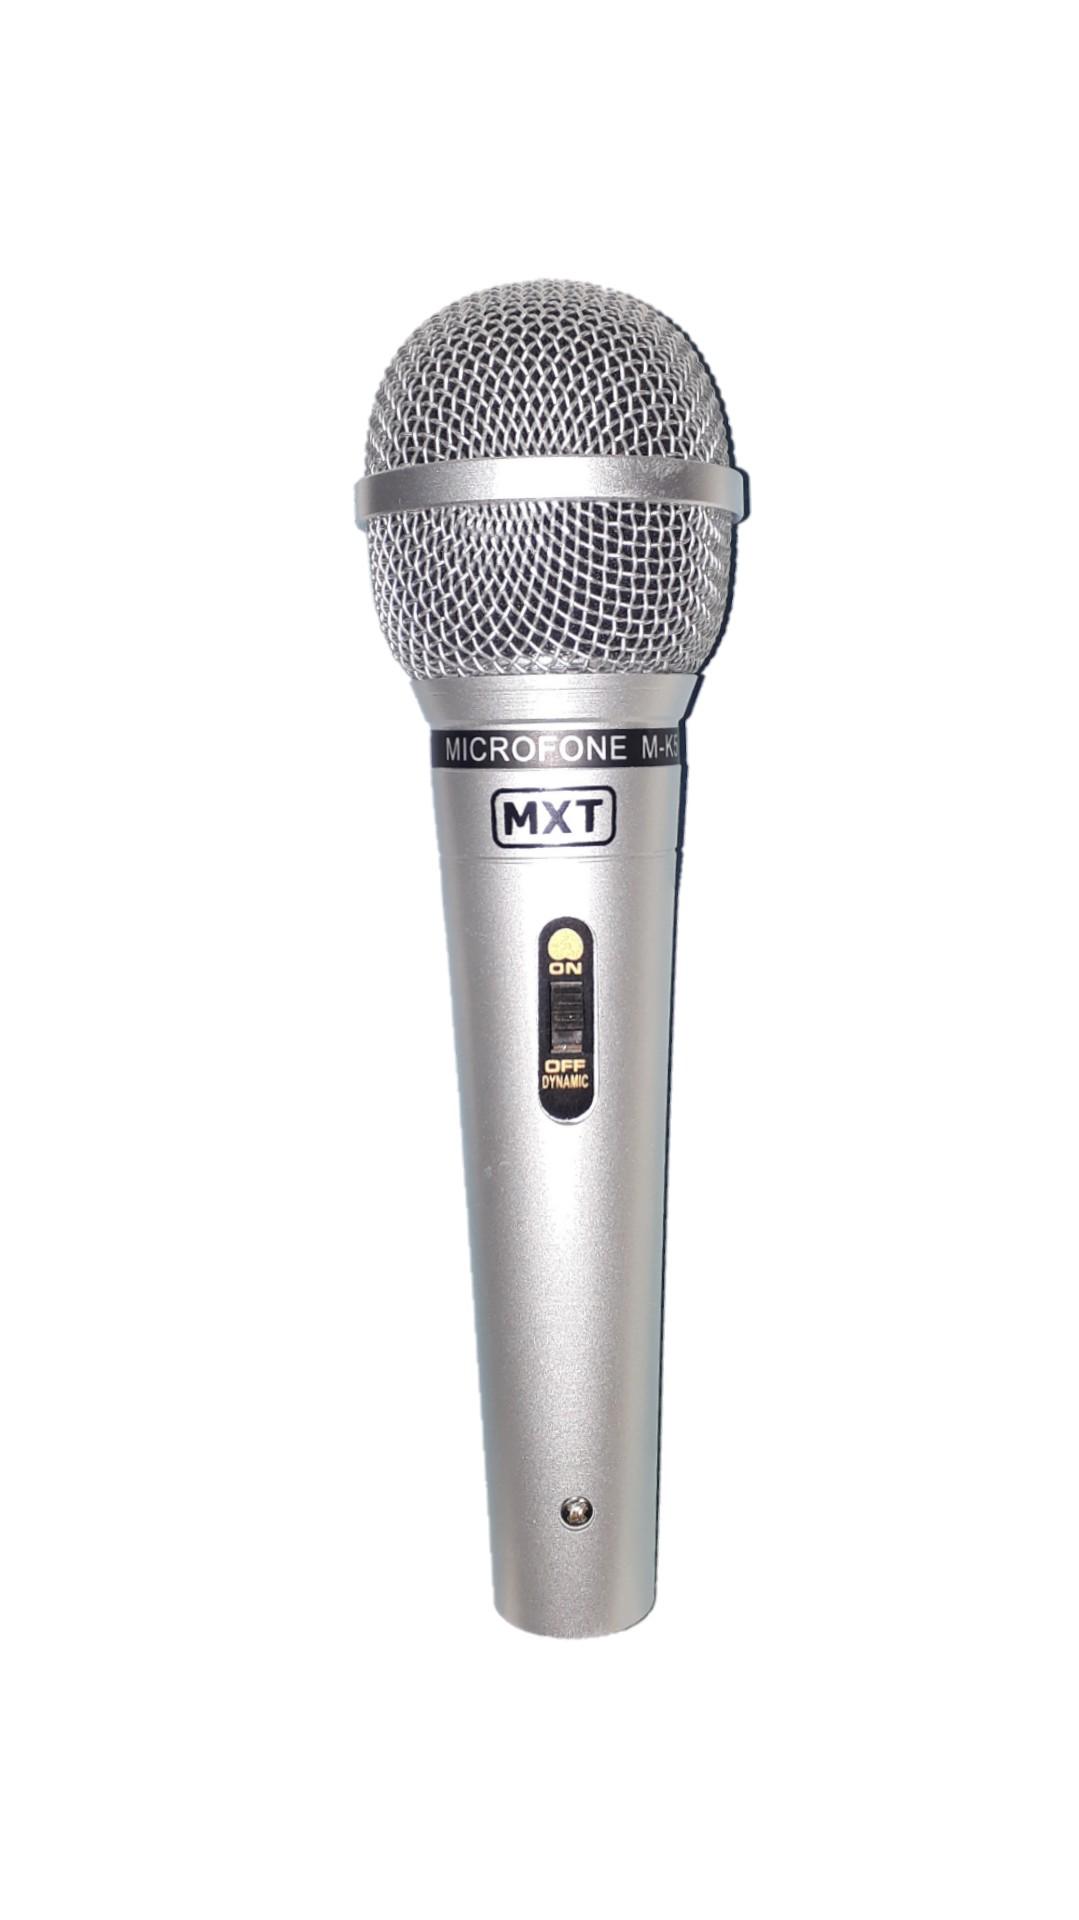 MICROFONE MXT MK5 541106 C/CABO PRATA